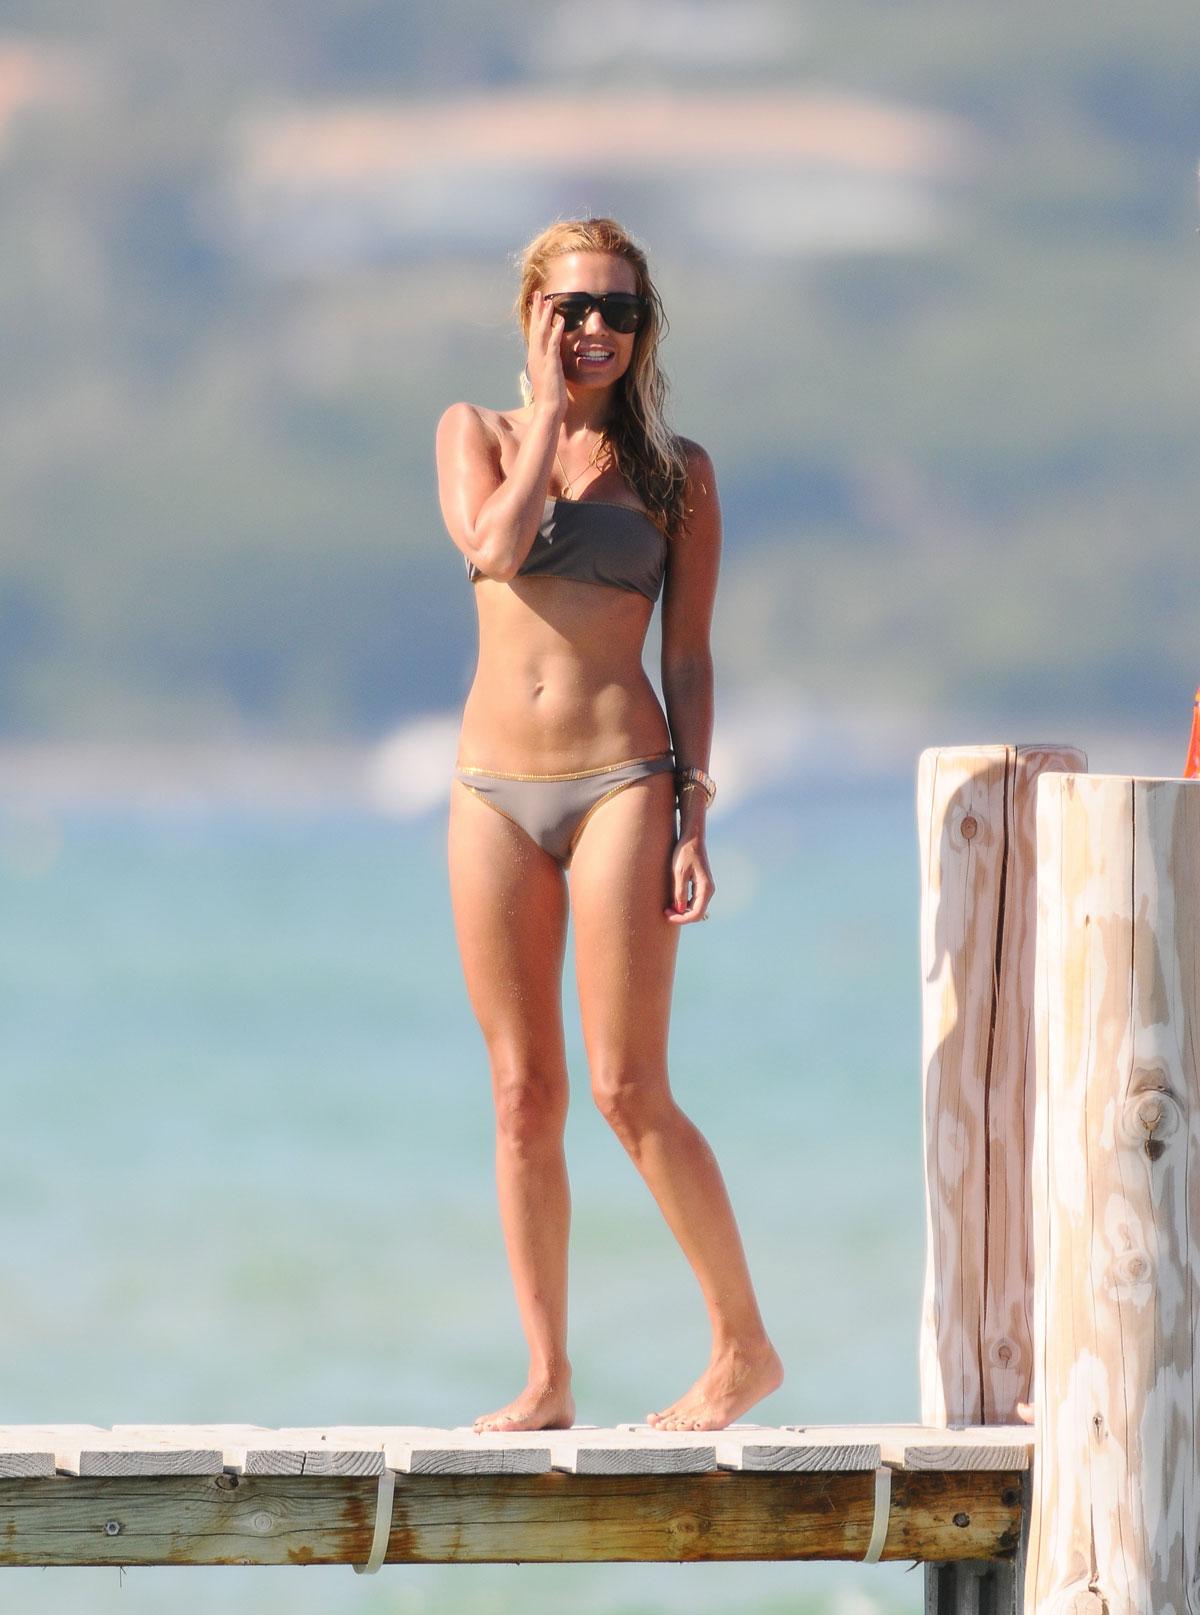 Sylvie van der vaart in bikini at club 55 in saint tropez hawtcelebs - Club 55 saint tropez ...